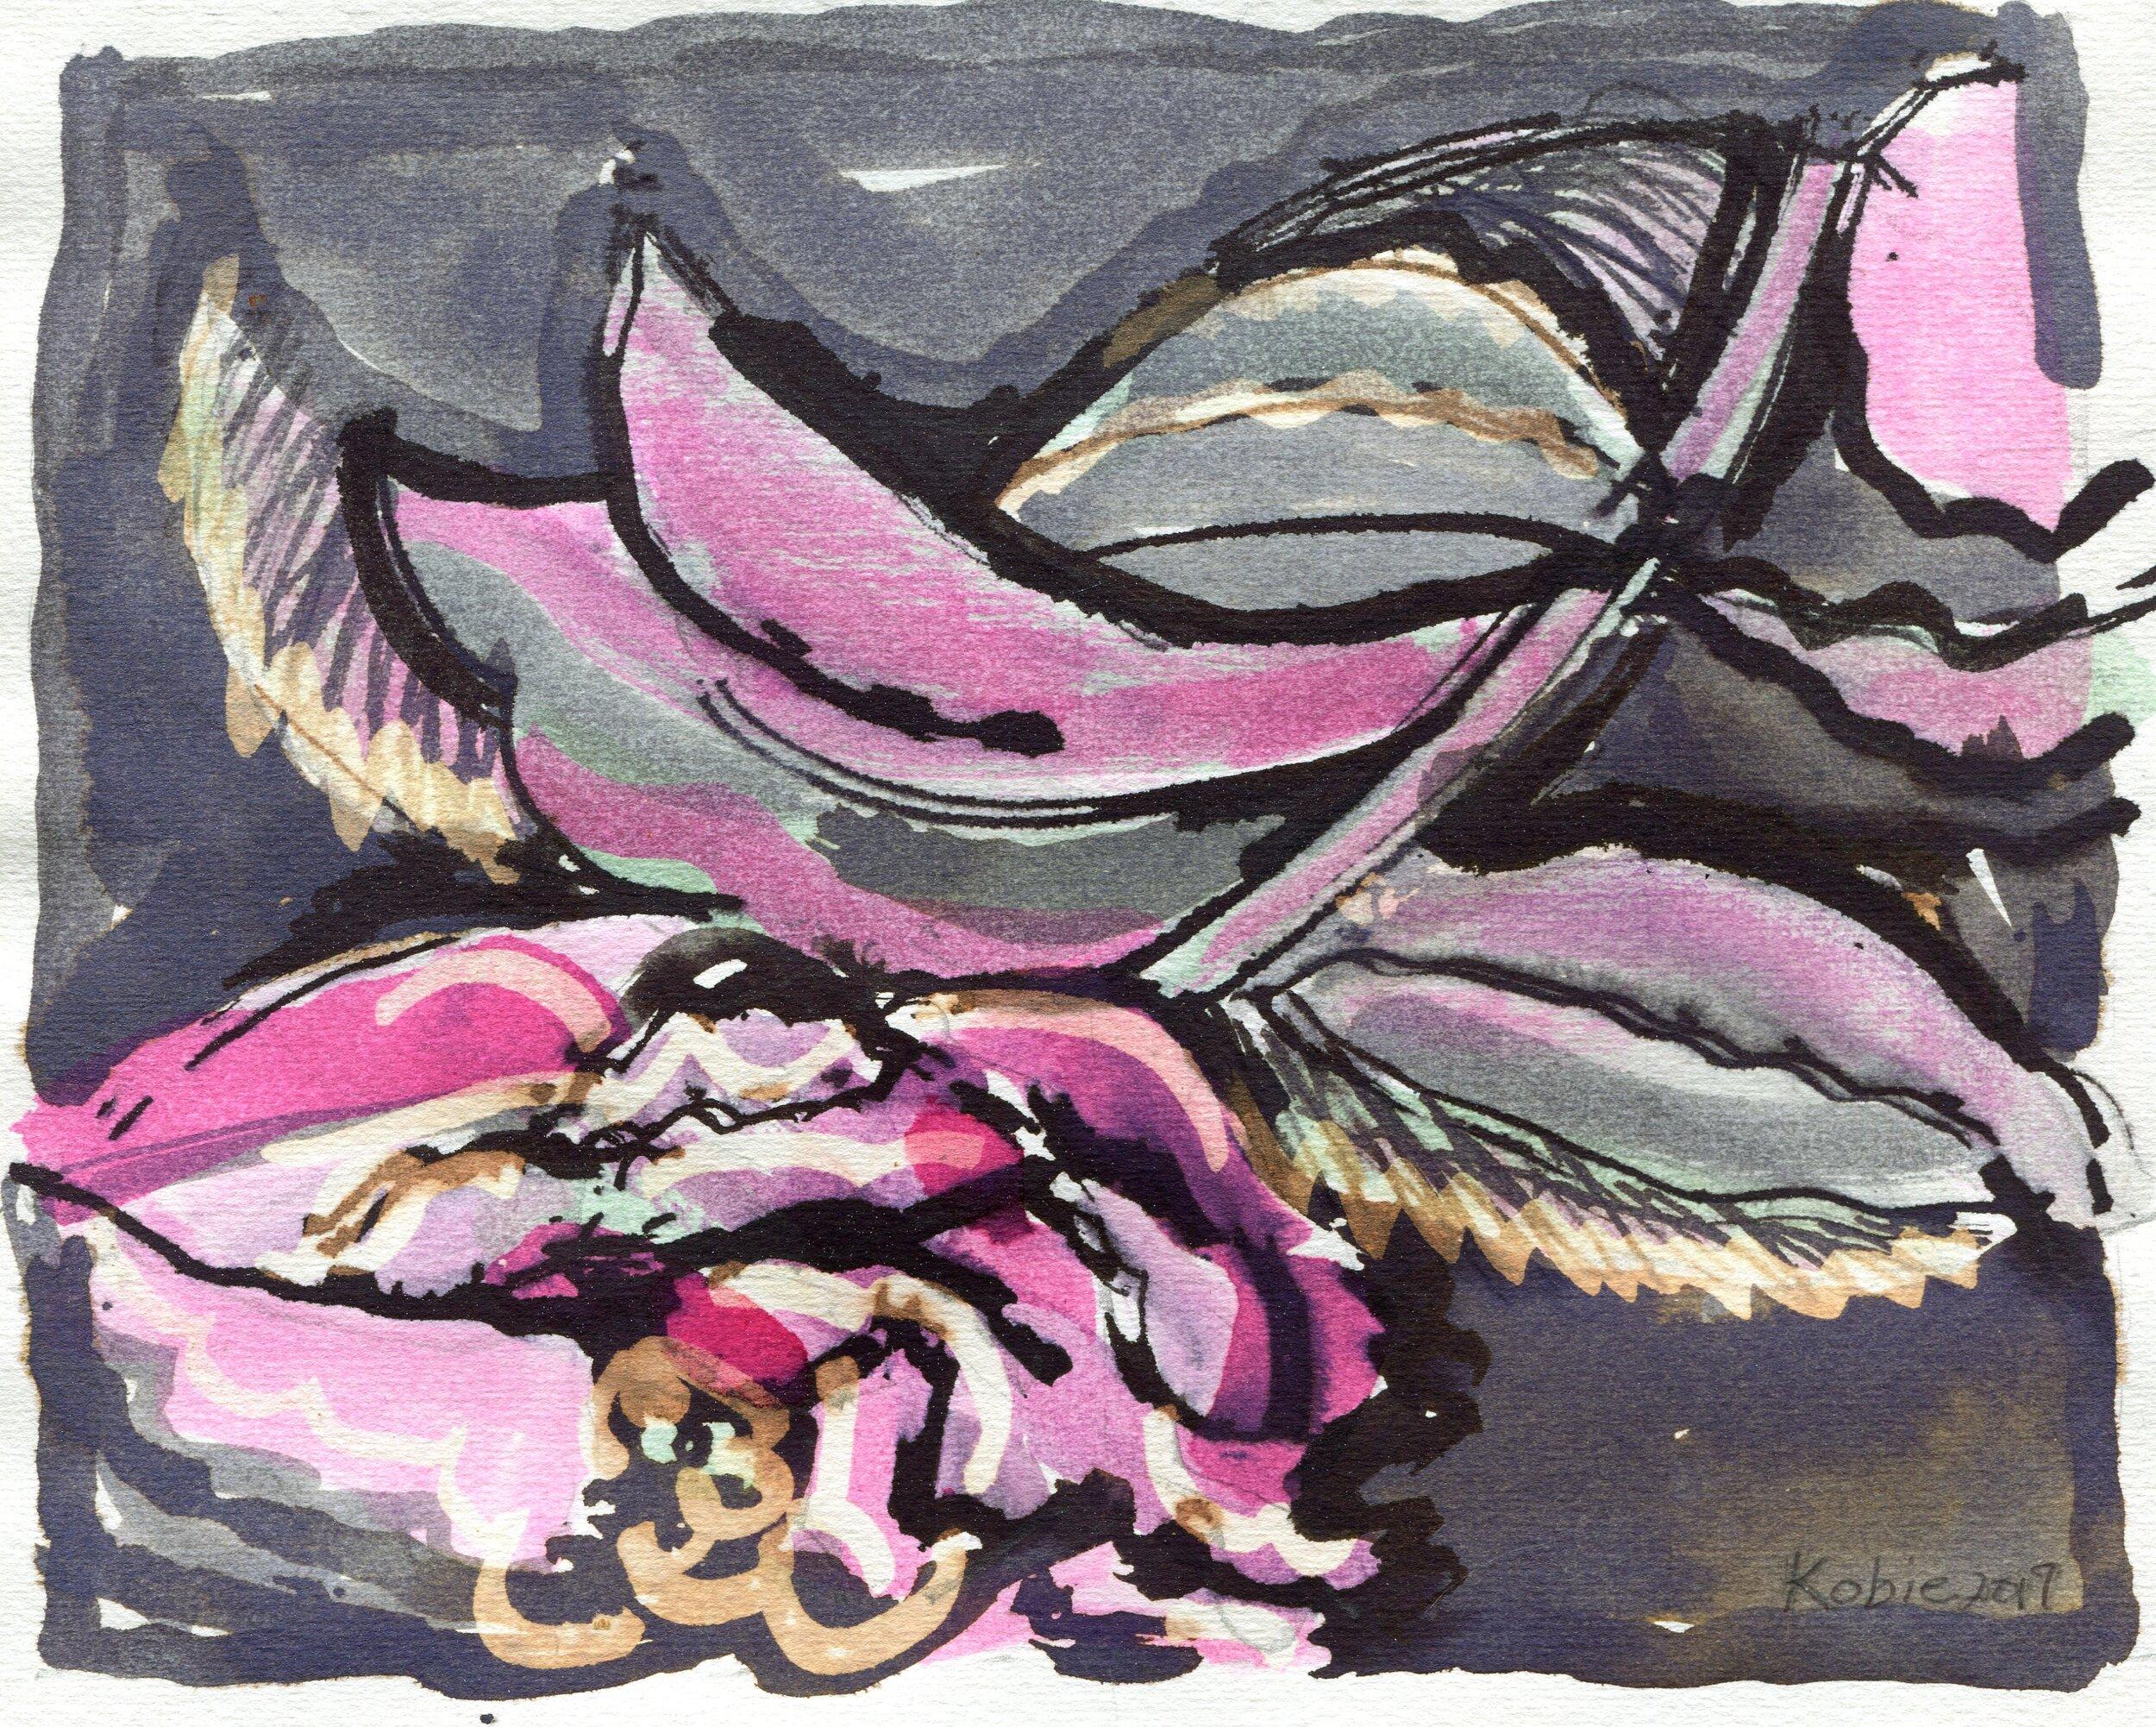 50a  Kobie Venter  Camellia 1  ink drawing on paper